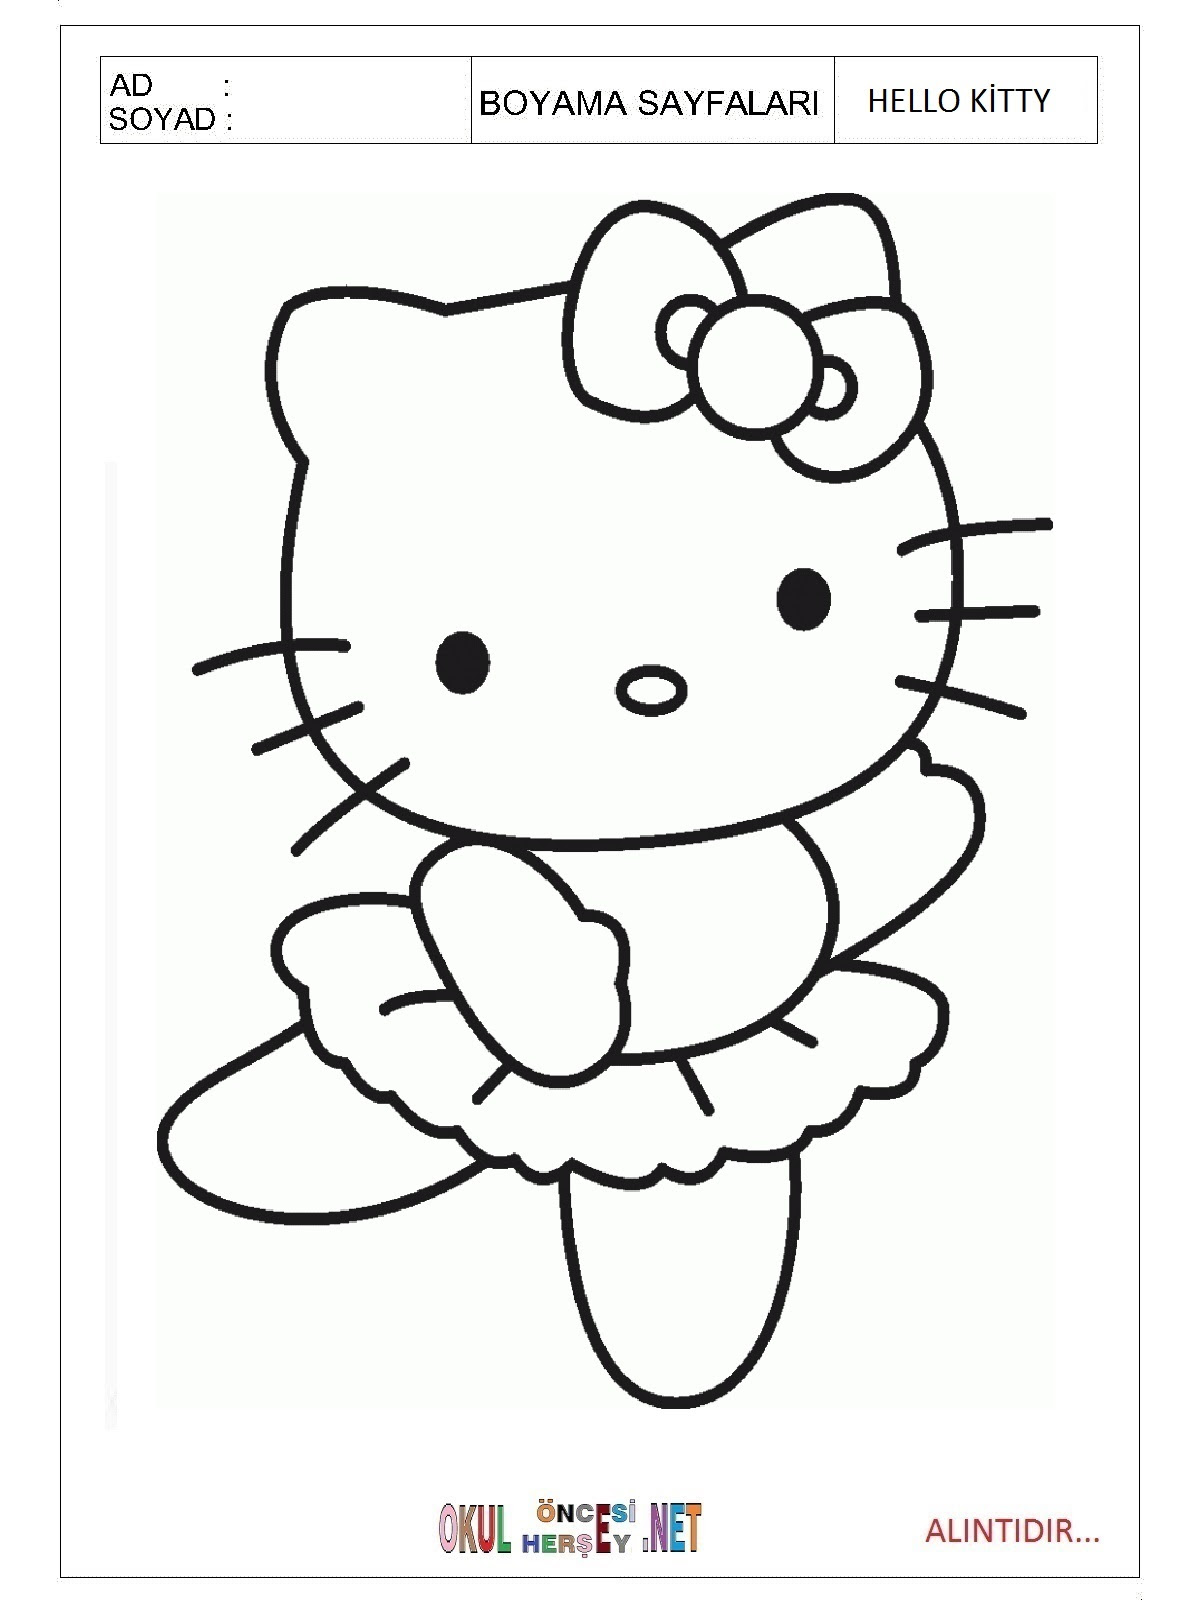 Hello Kitty Boyama Sayfalari